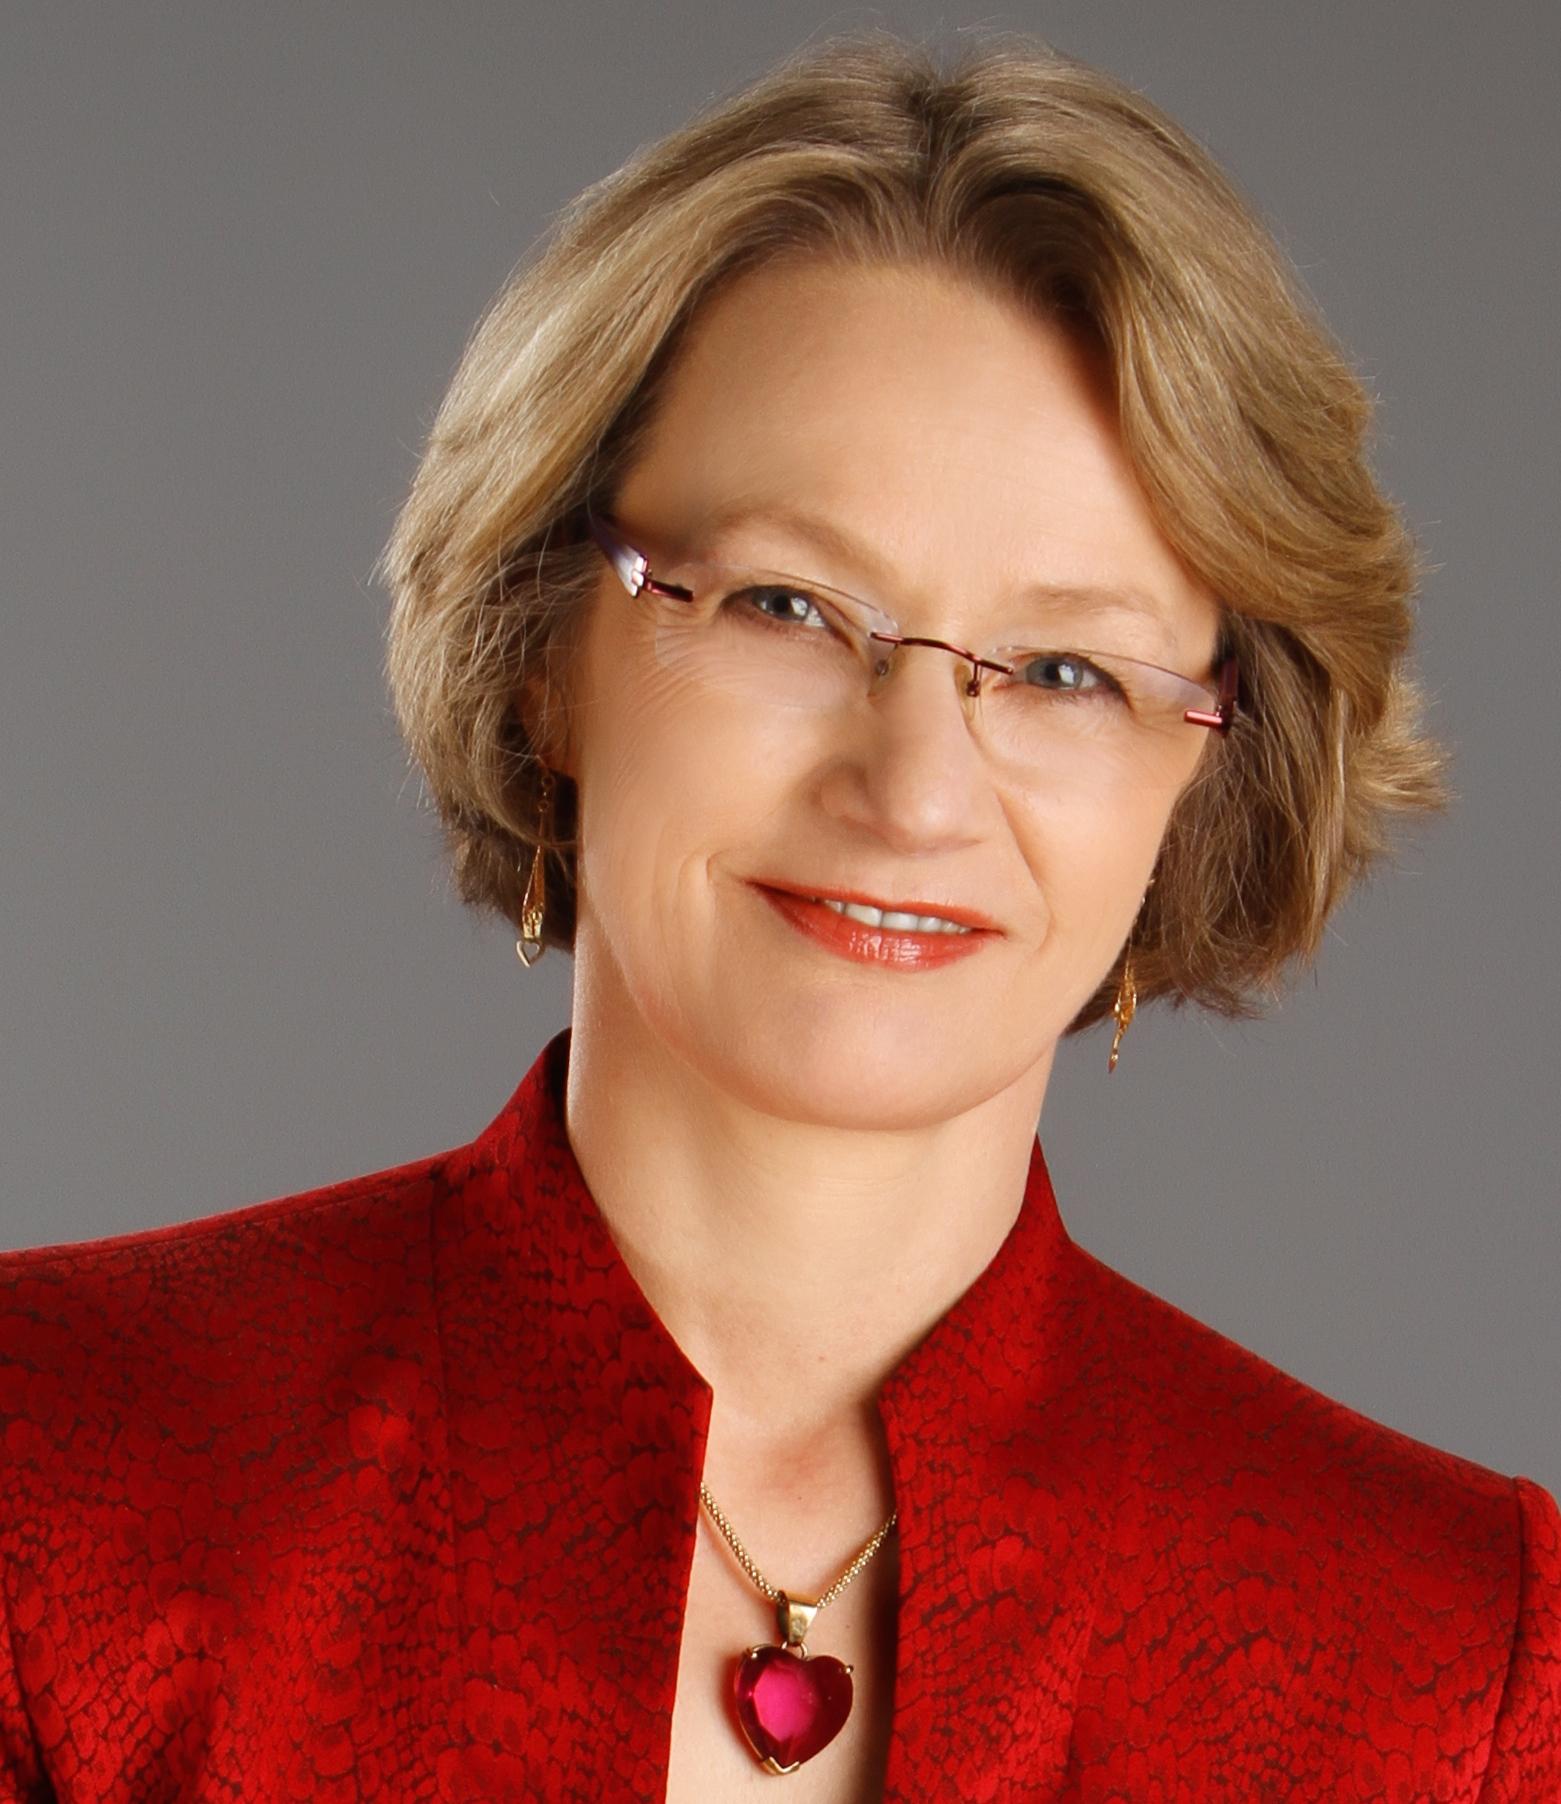 Ulrike Berzau